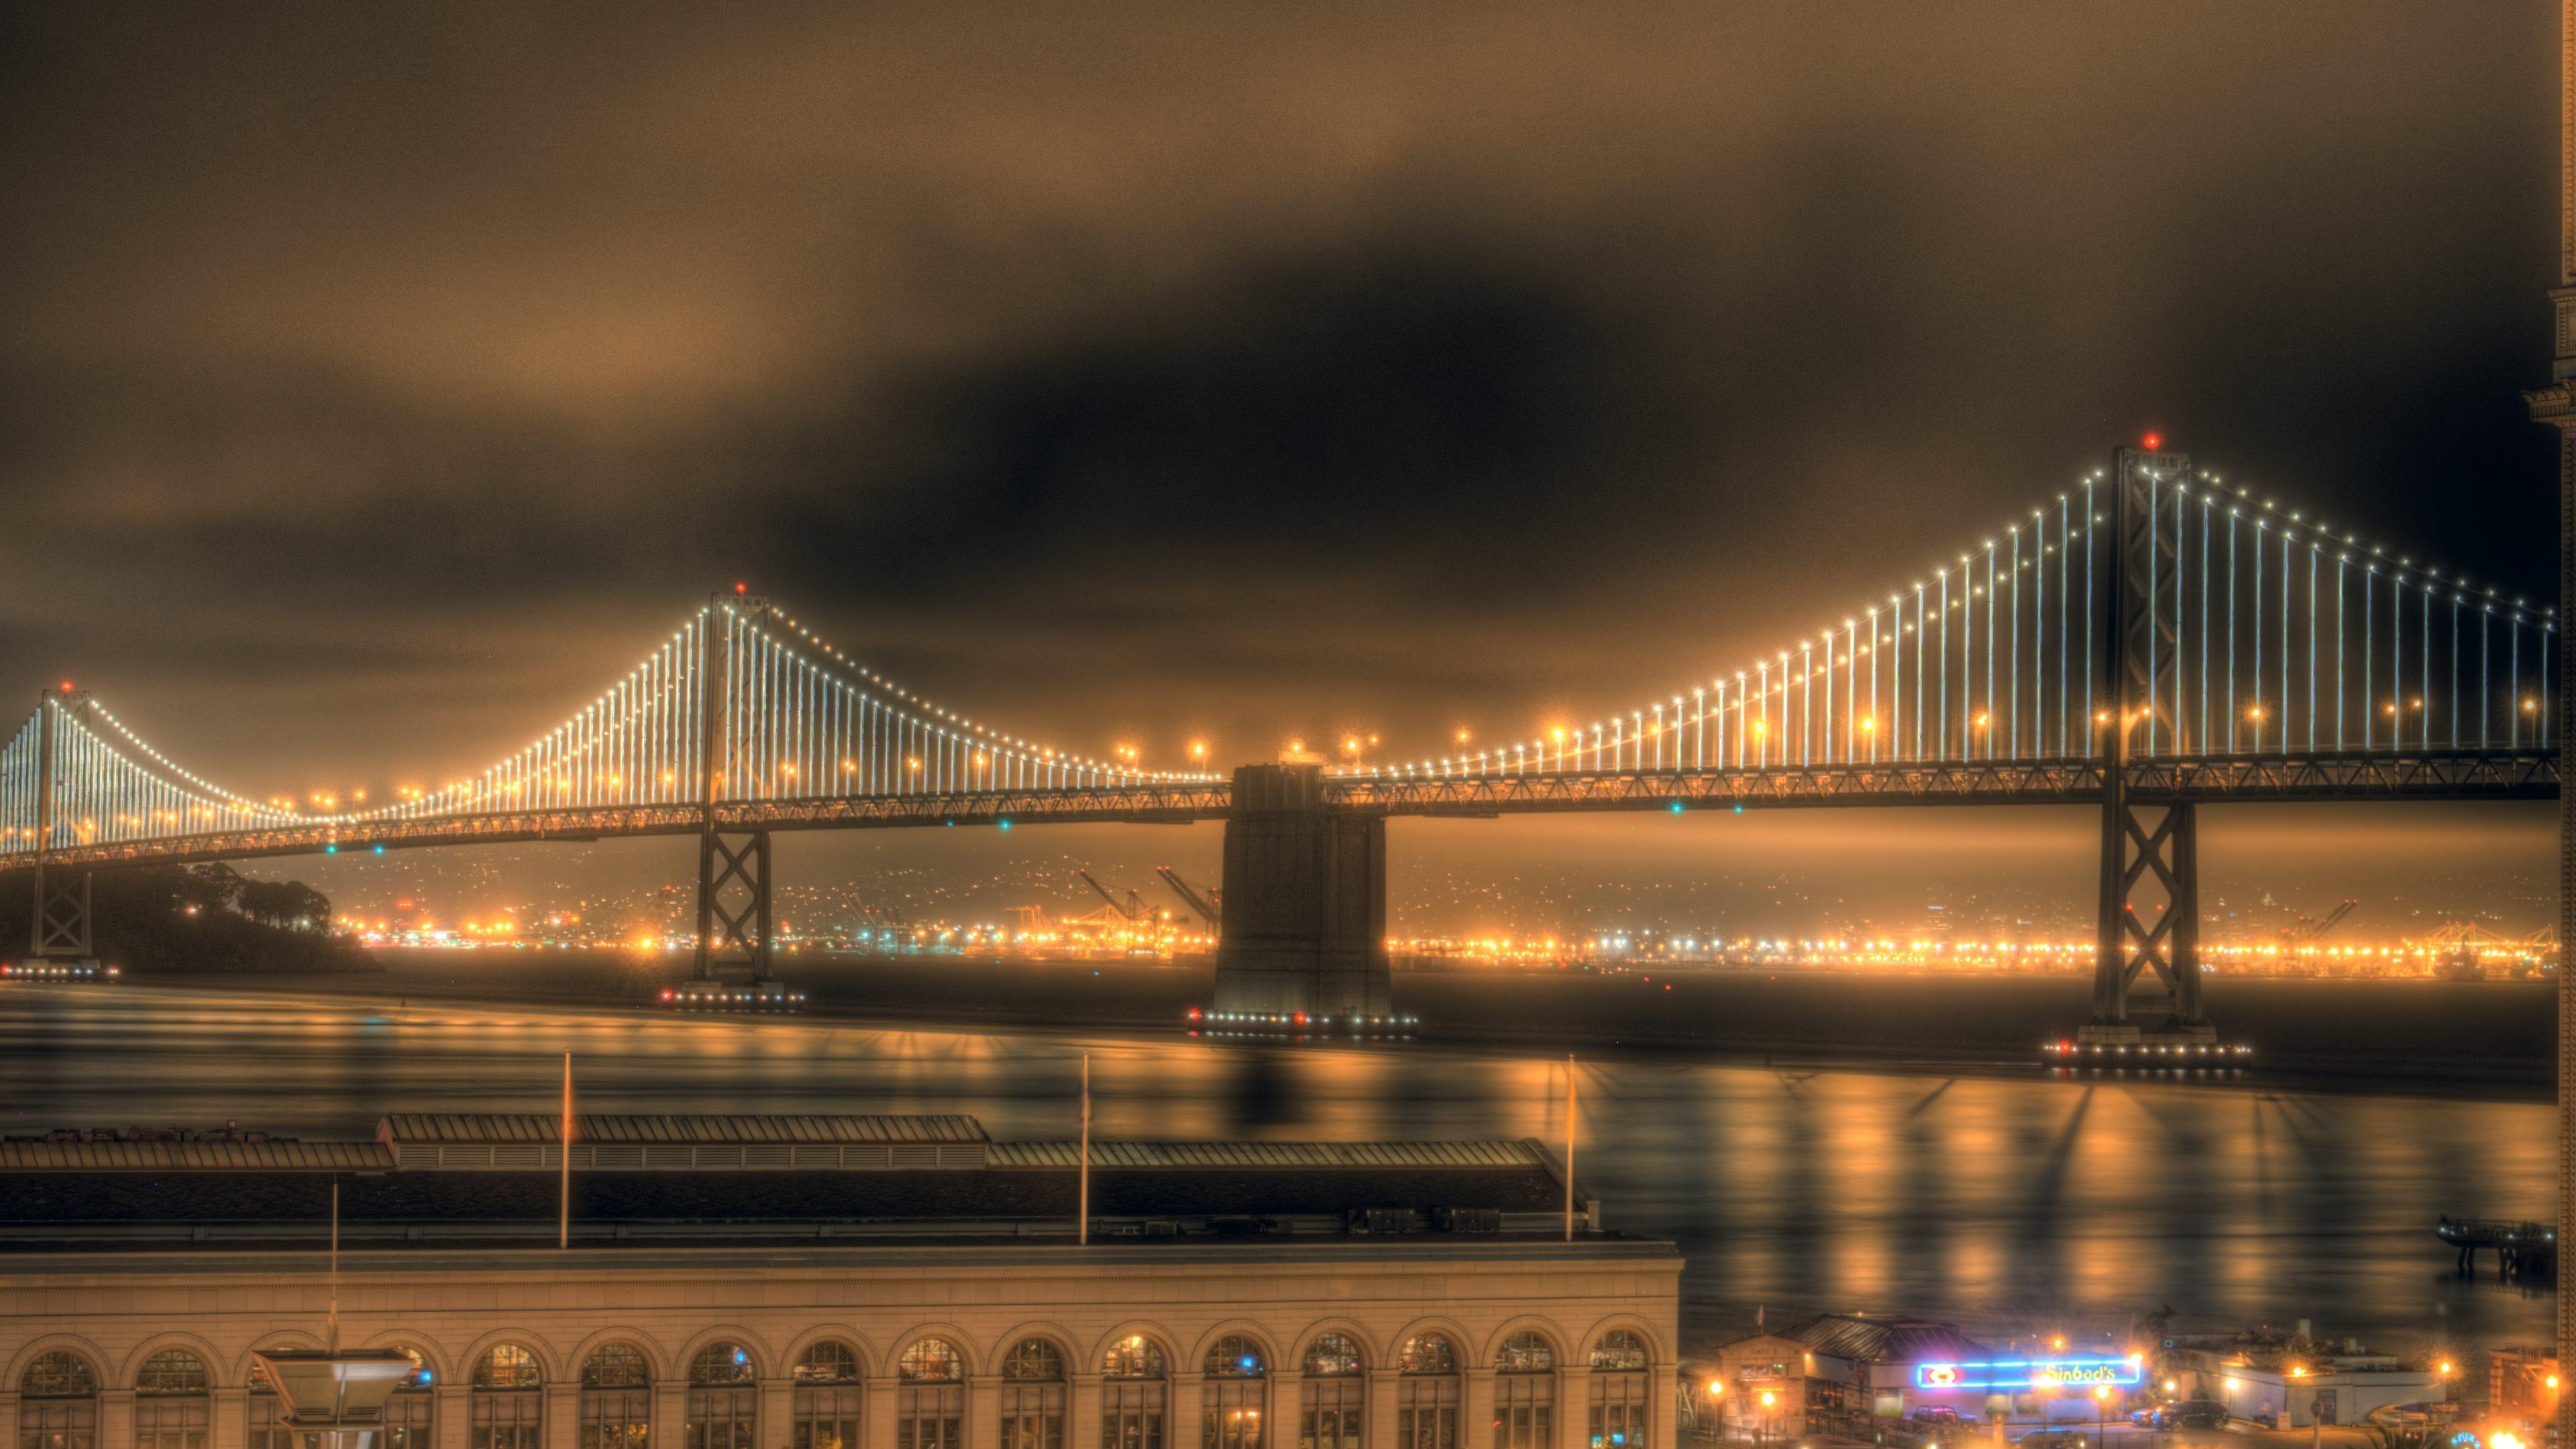 20 bay bridge hd wallpapers backgrounds wallpaper abyss - Bridge wallpaper hd ...